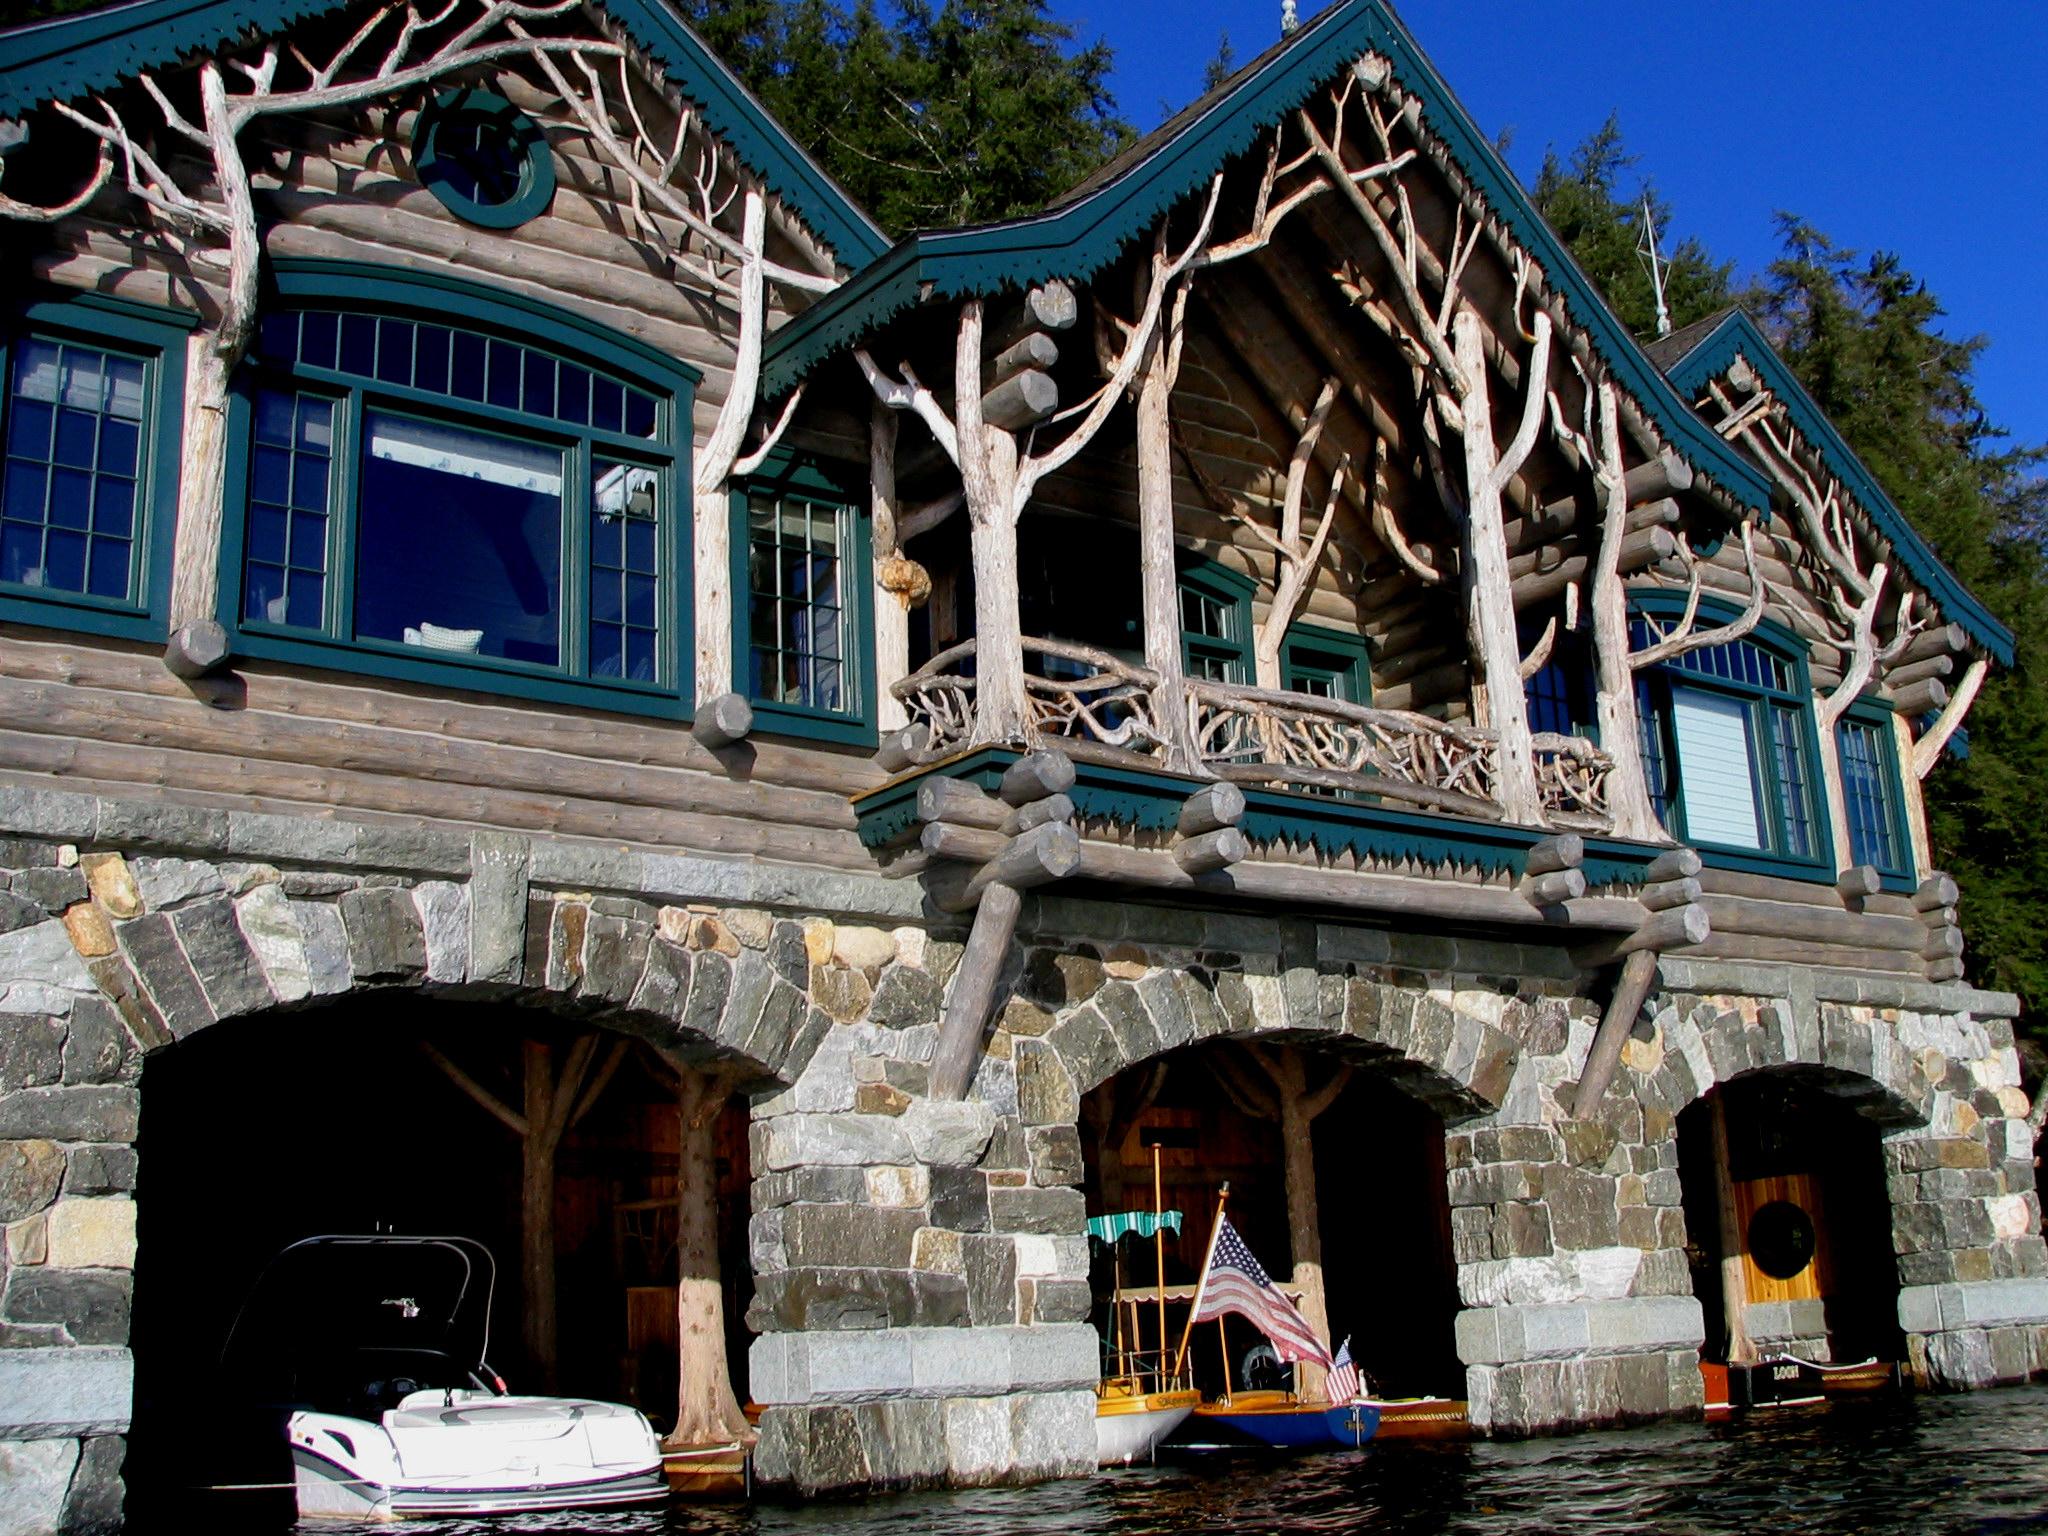 https://upload.wikimedia.org/wikipedia/commons/4/44/Closeup_of_boathouse_2.jpg